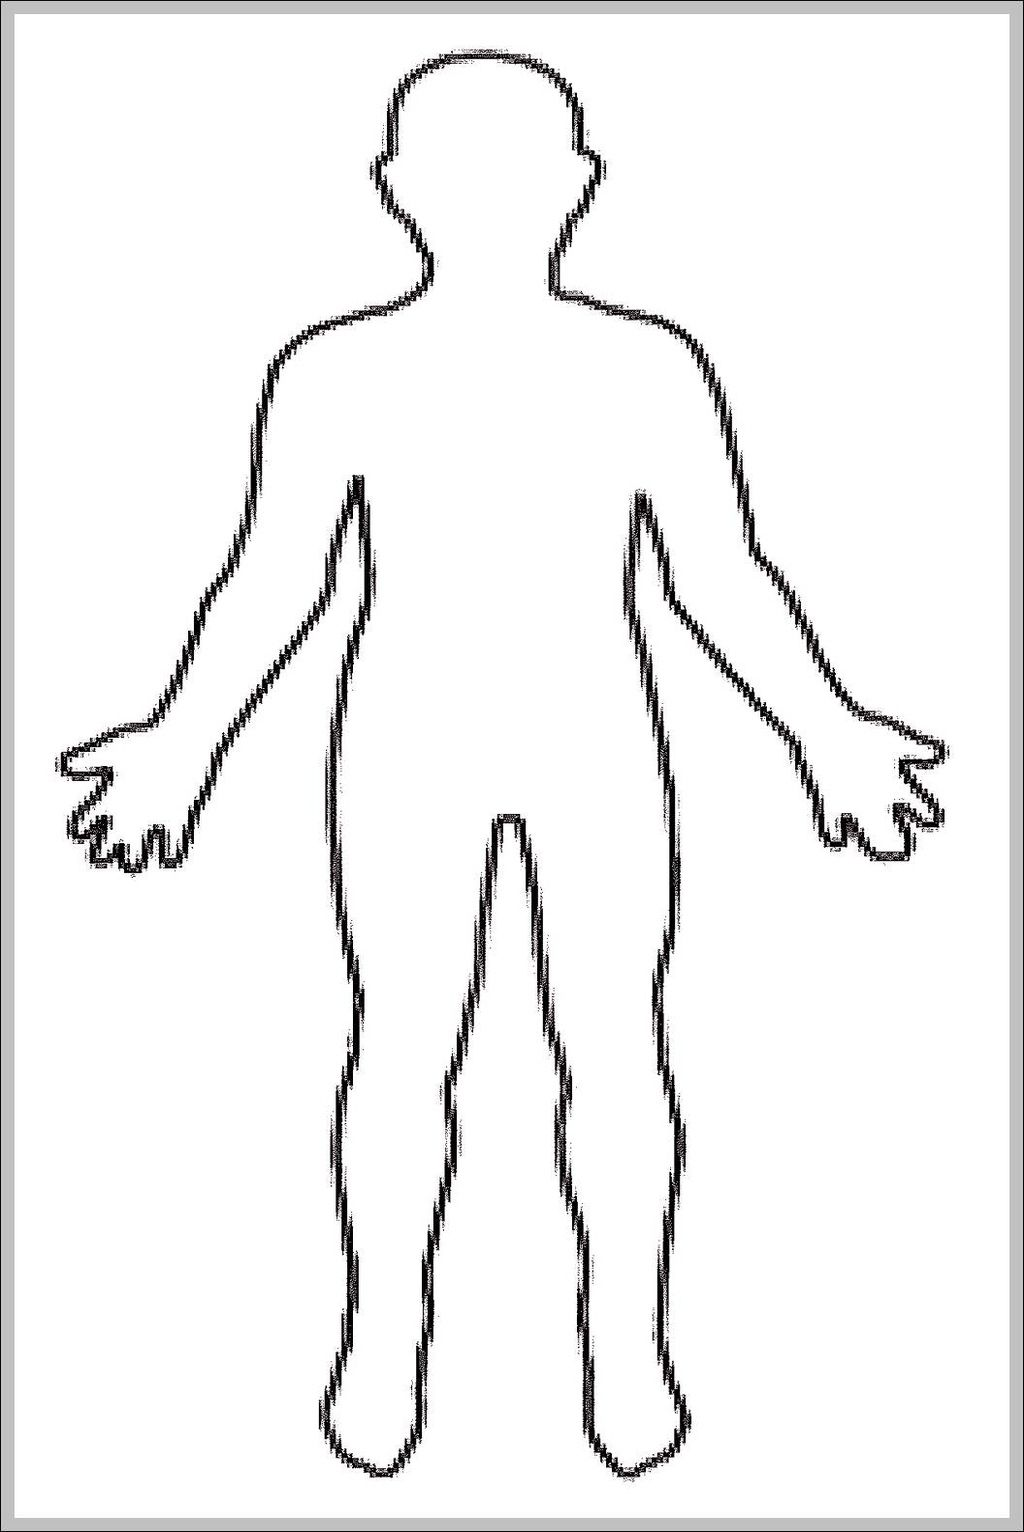 body diagram unlabeled wiring diagram dat upper body diagram unlabeled